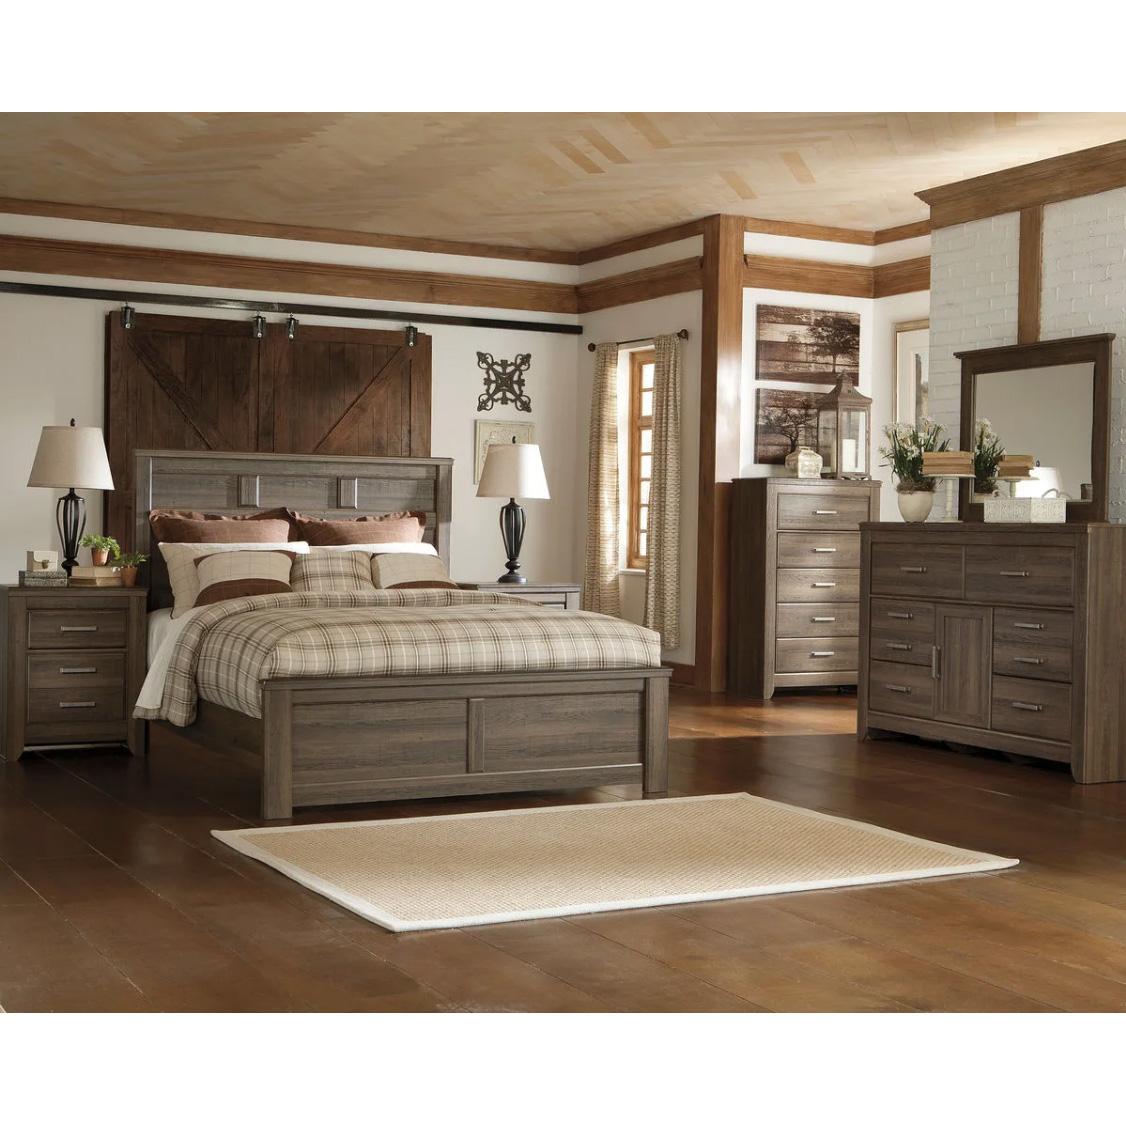 Juararo - Dark Brown - 6 Pc. - Dresser, Mirror, Chest & Queen Panel Bed